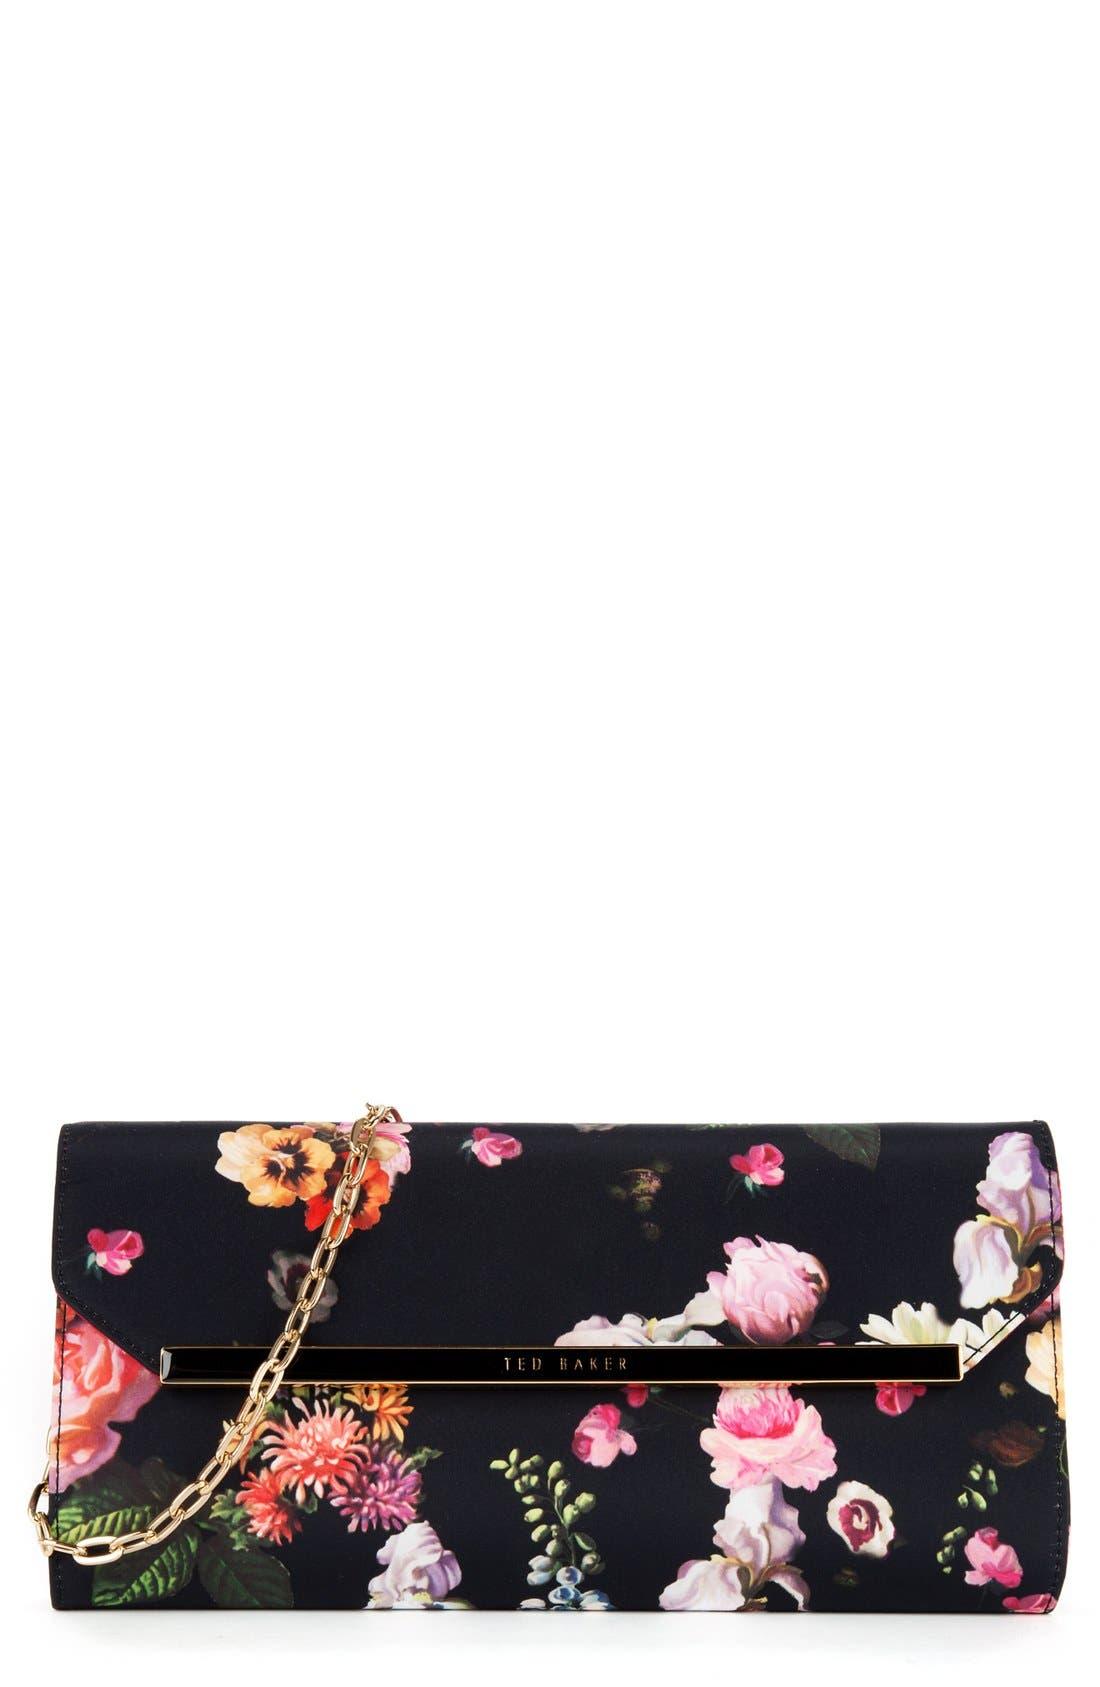 Alternate Image 1 Selected - Ted Baker London Floral Clutch